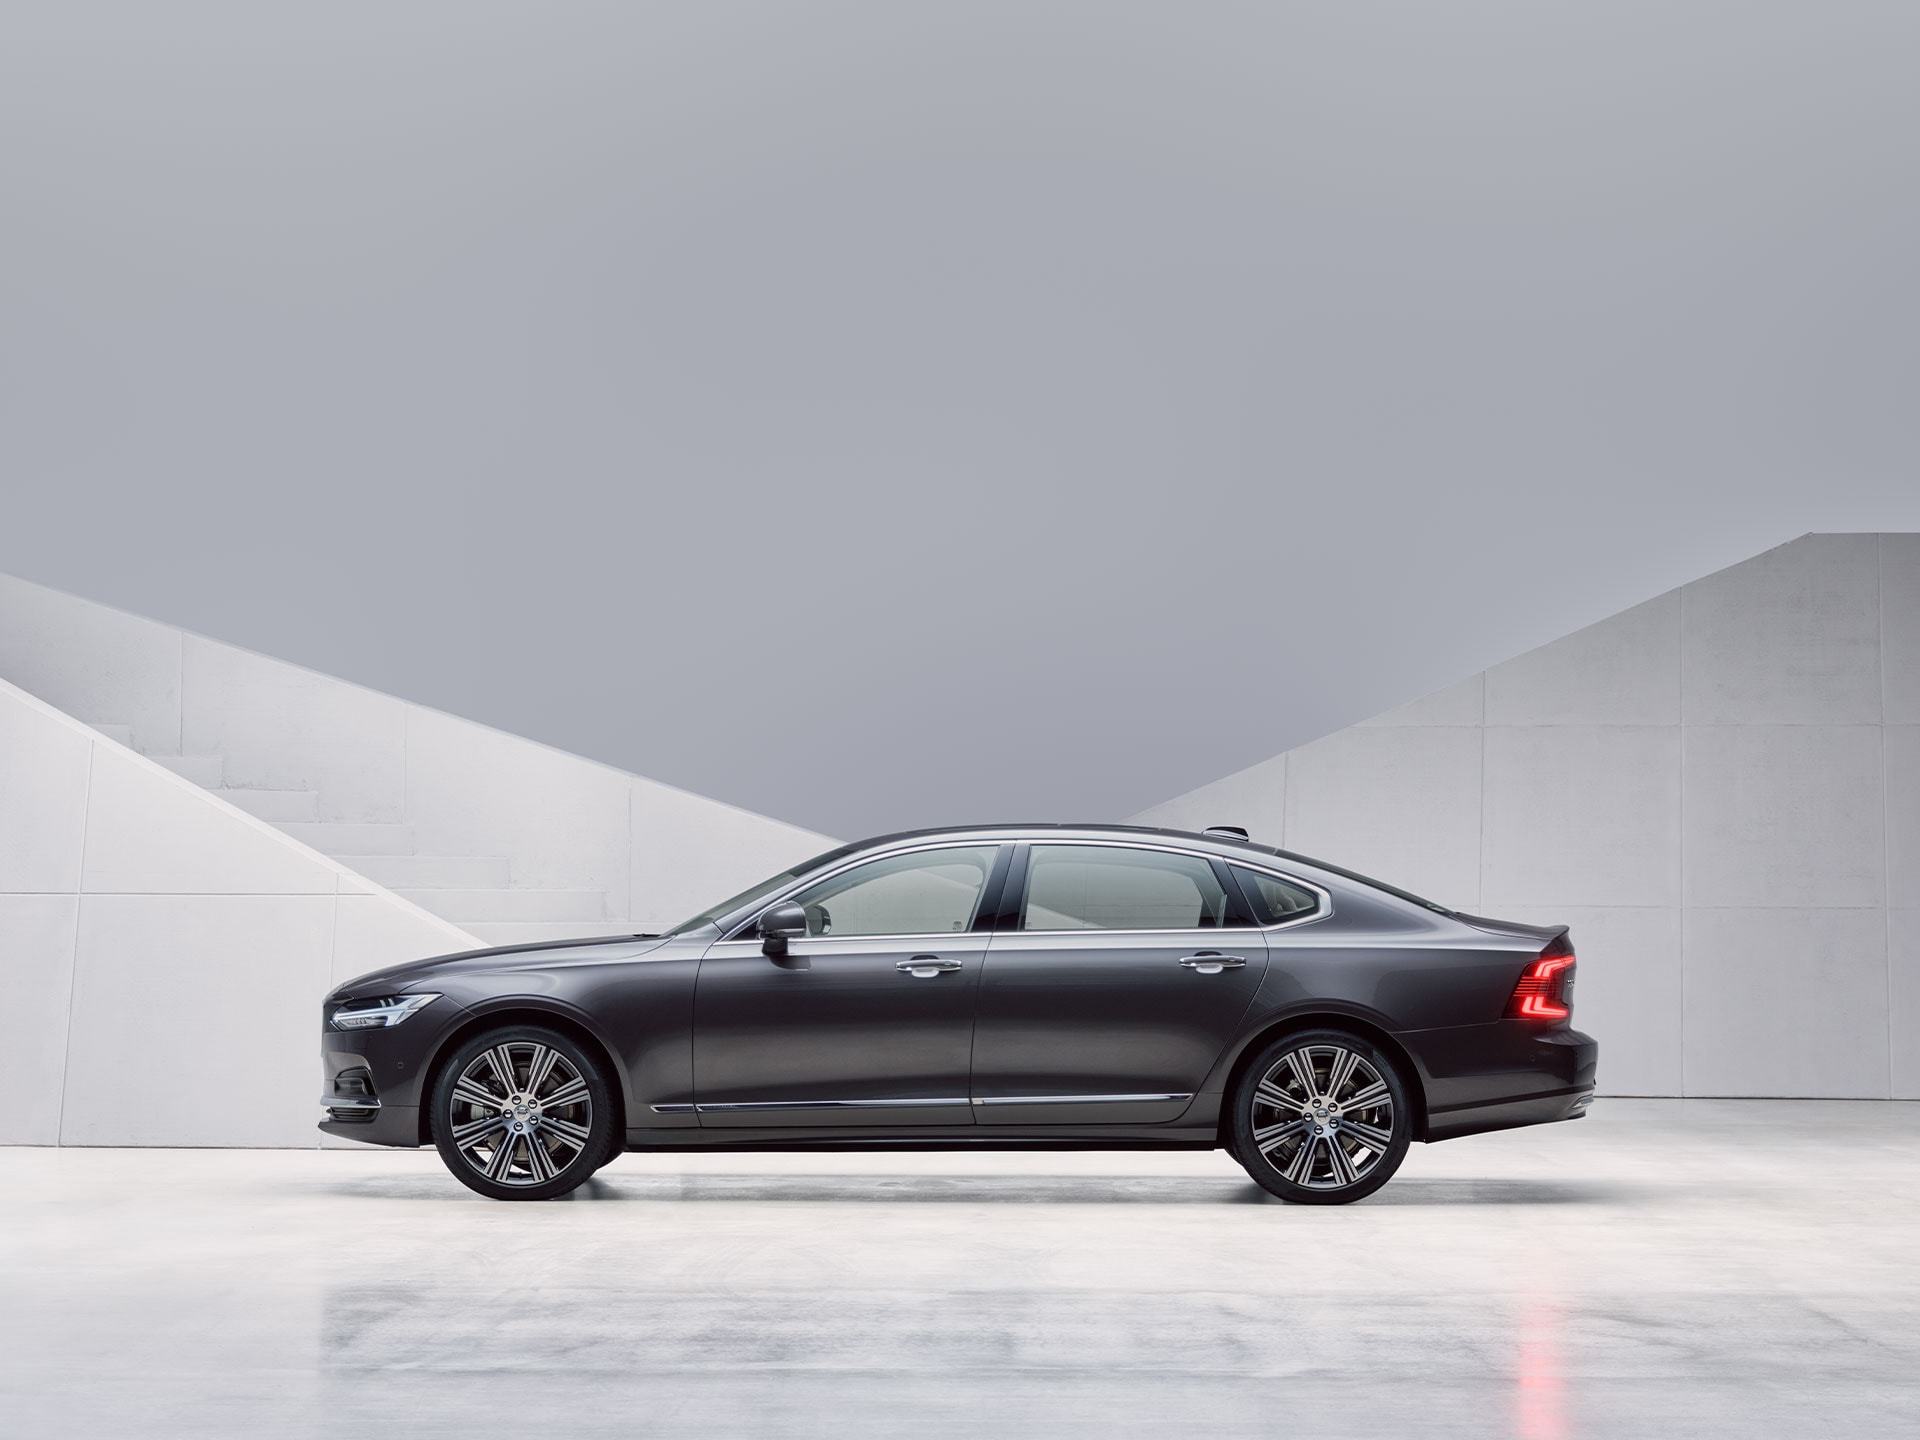 Темен Volvo S90 е паркиран пред сив ѕид.